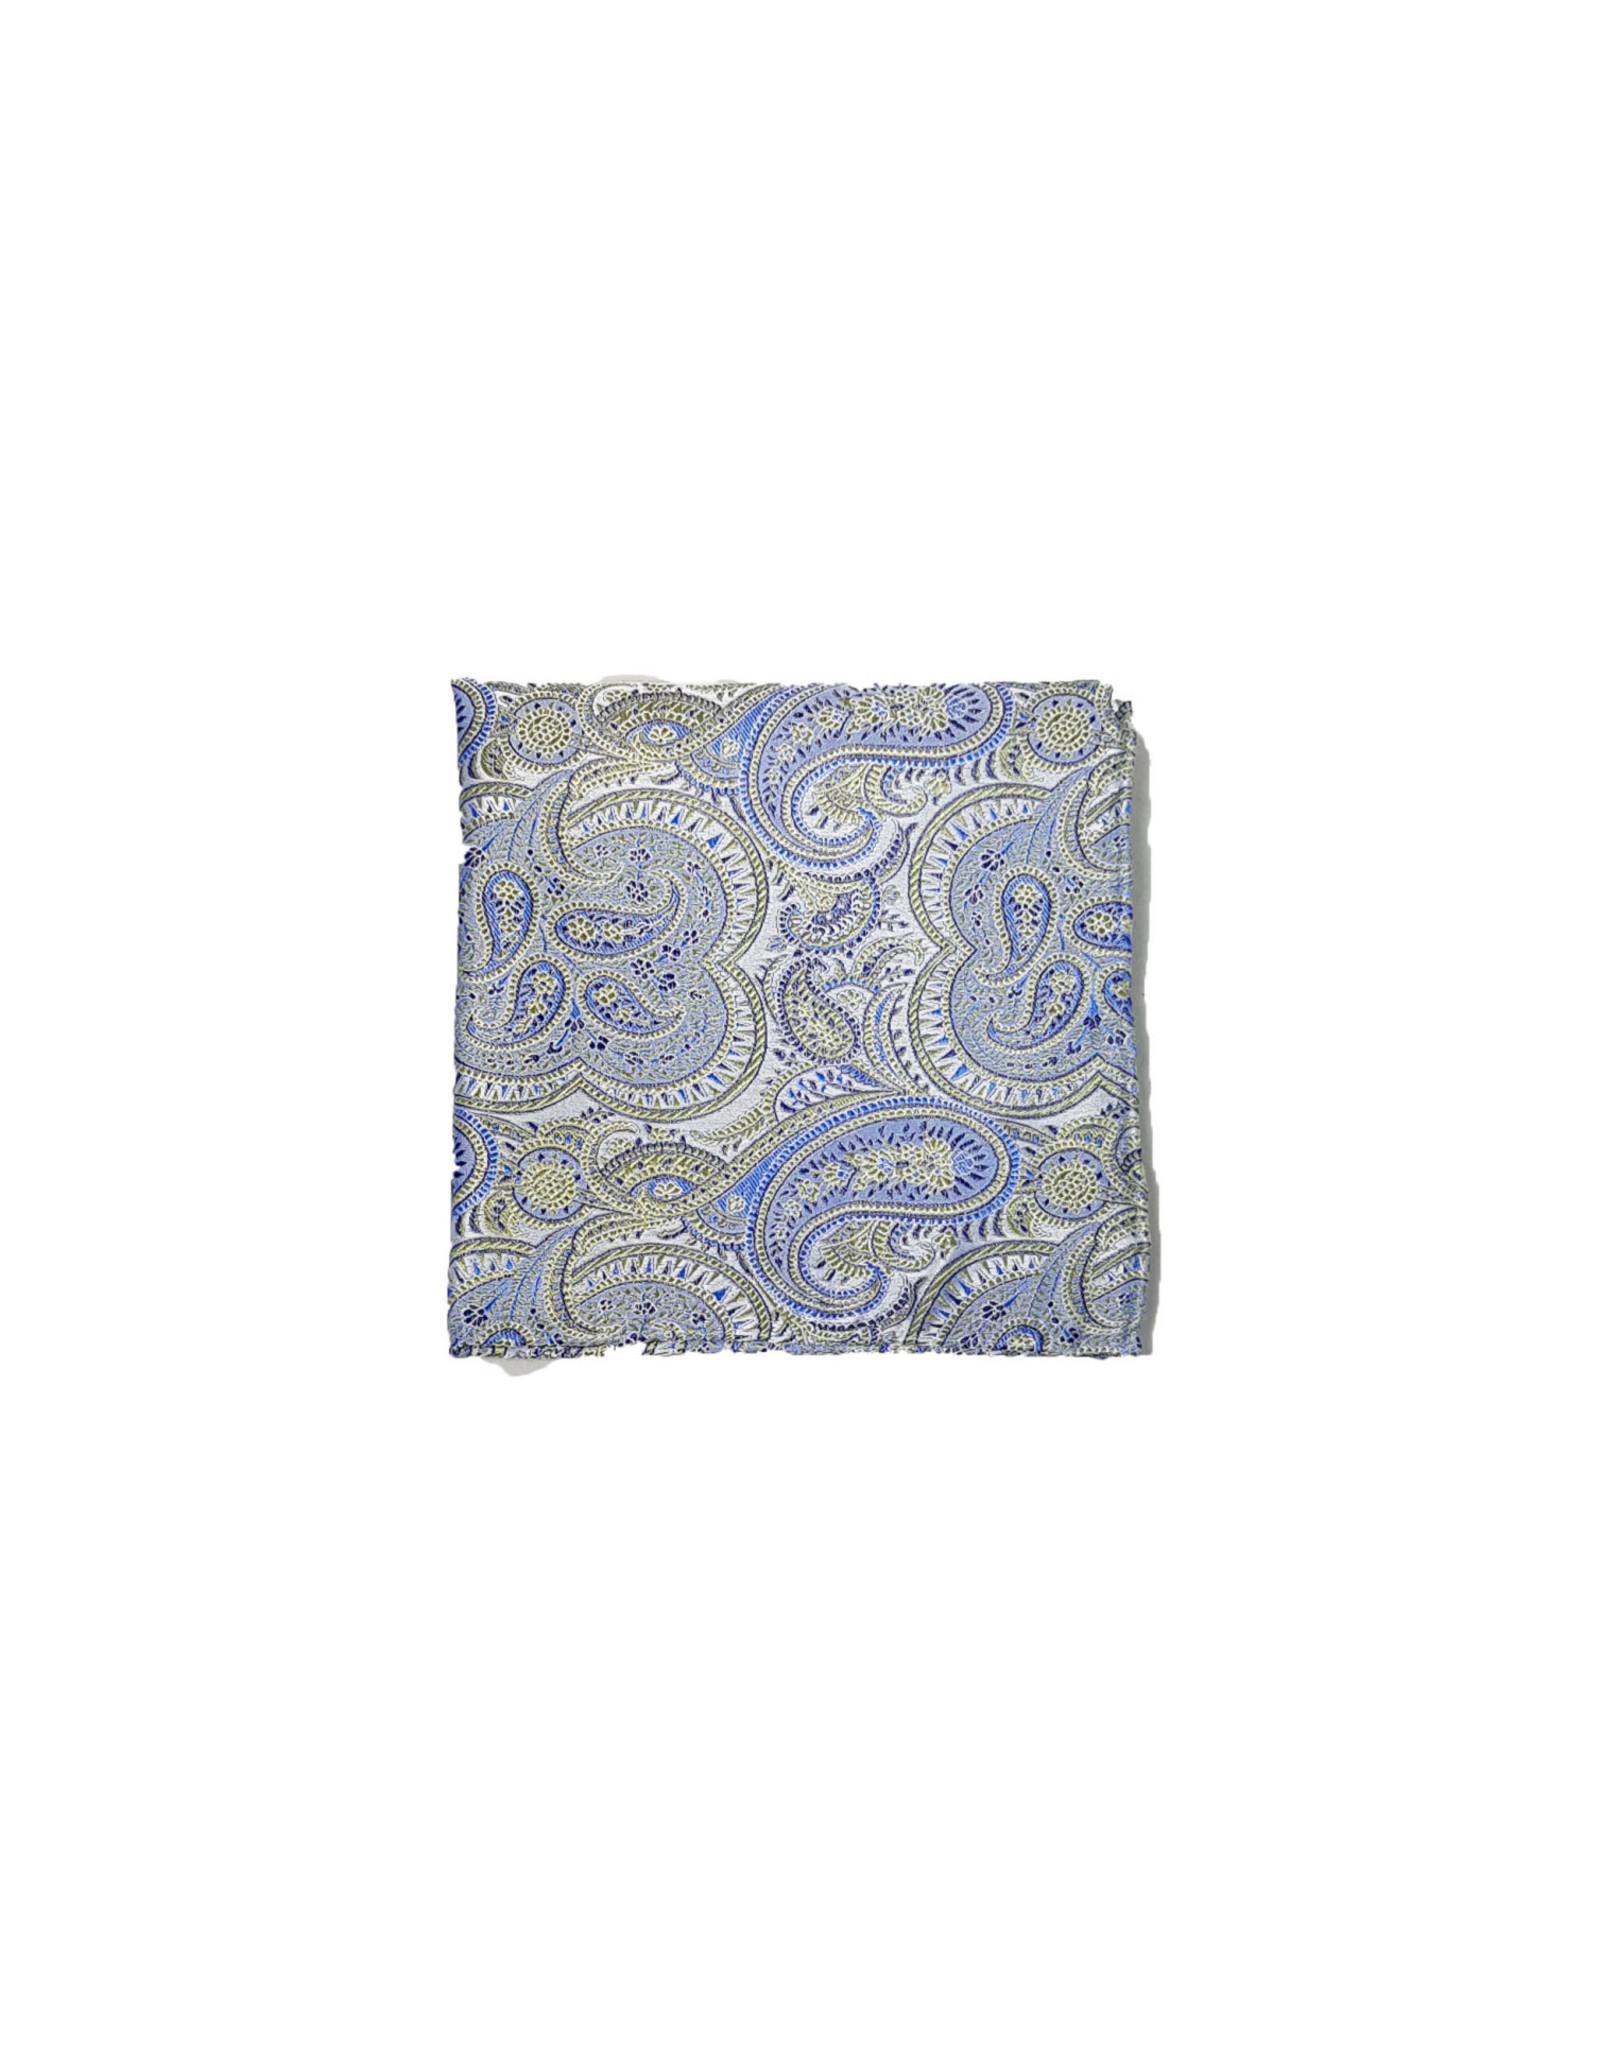 Ascot Sandmore's pochet lichtblauw-groen paisley